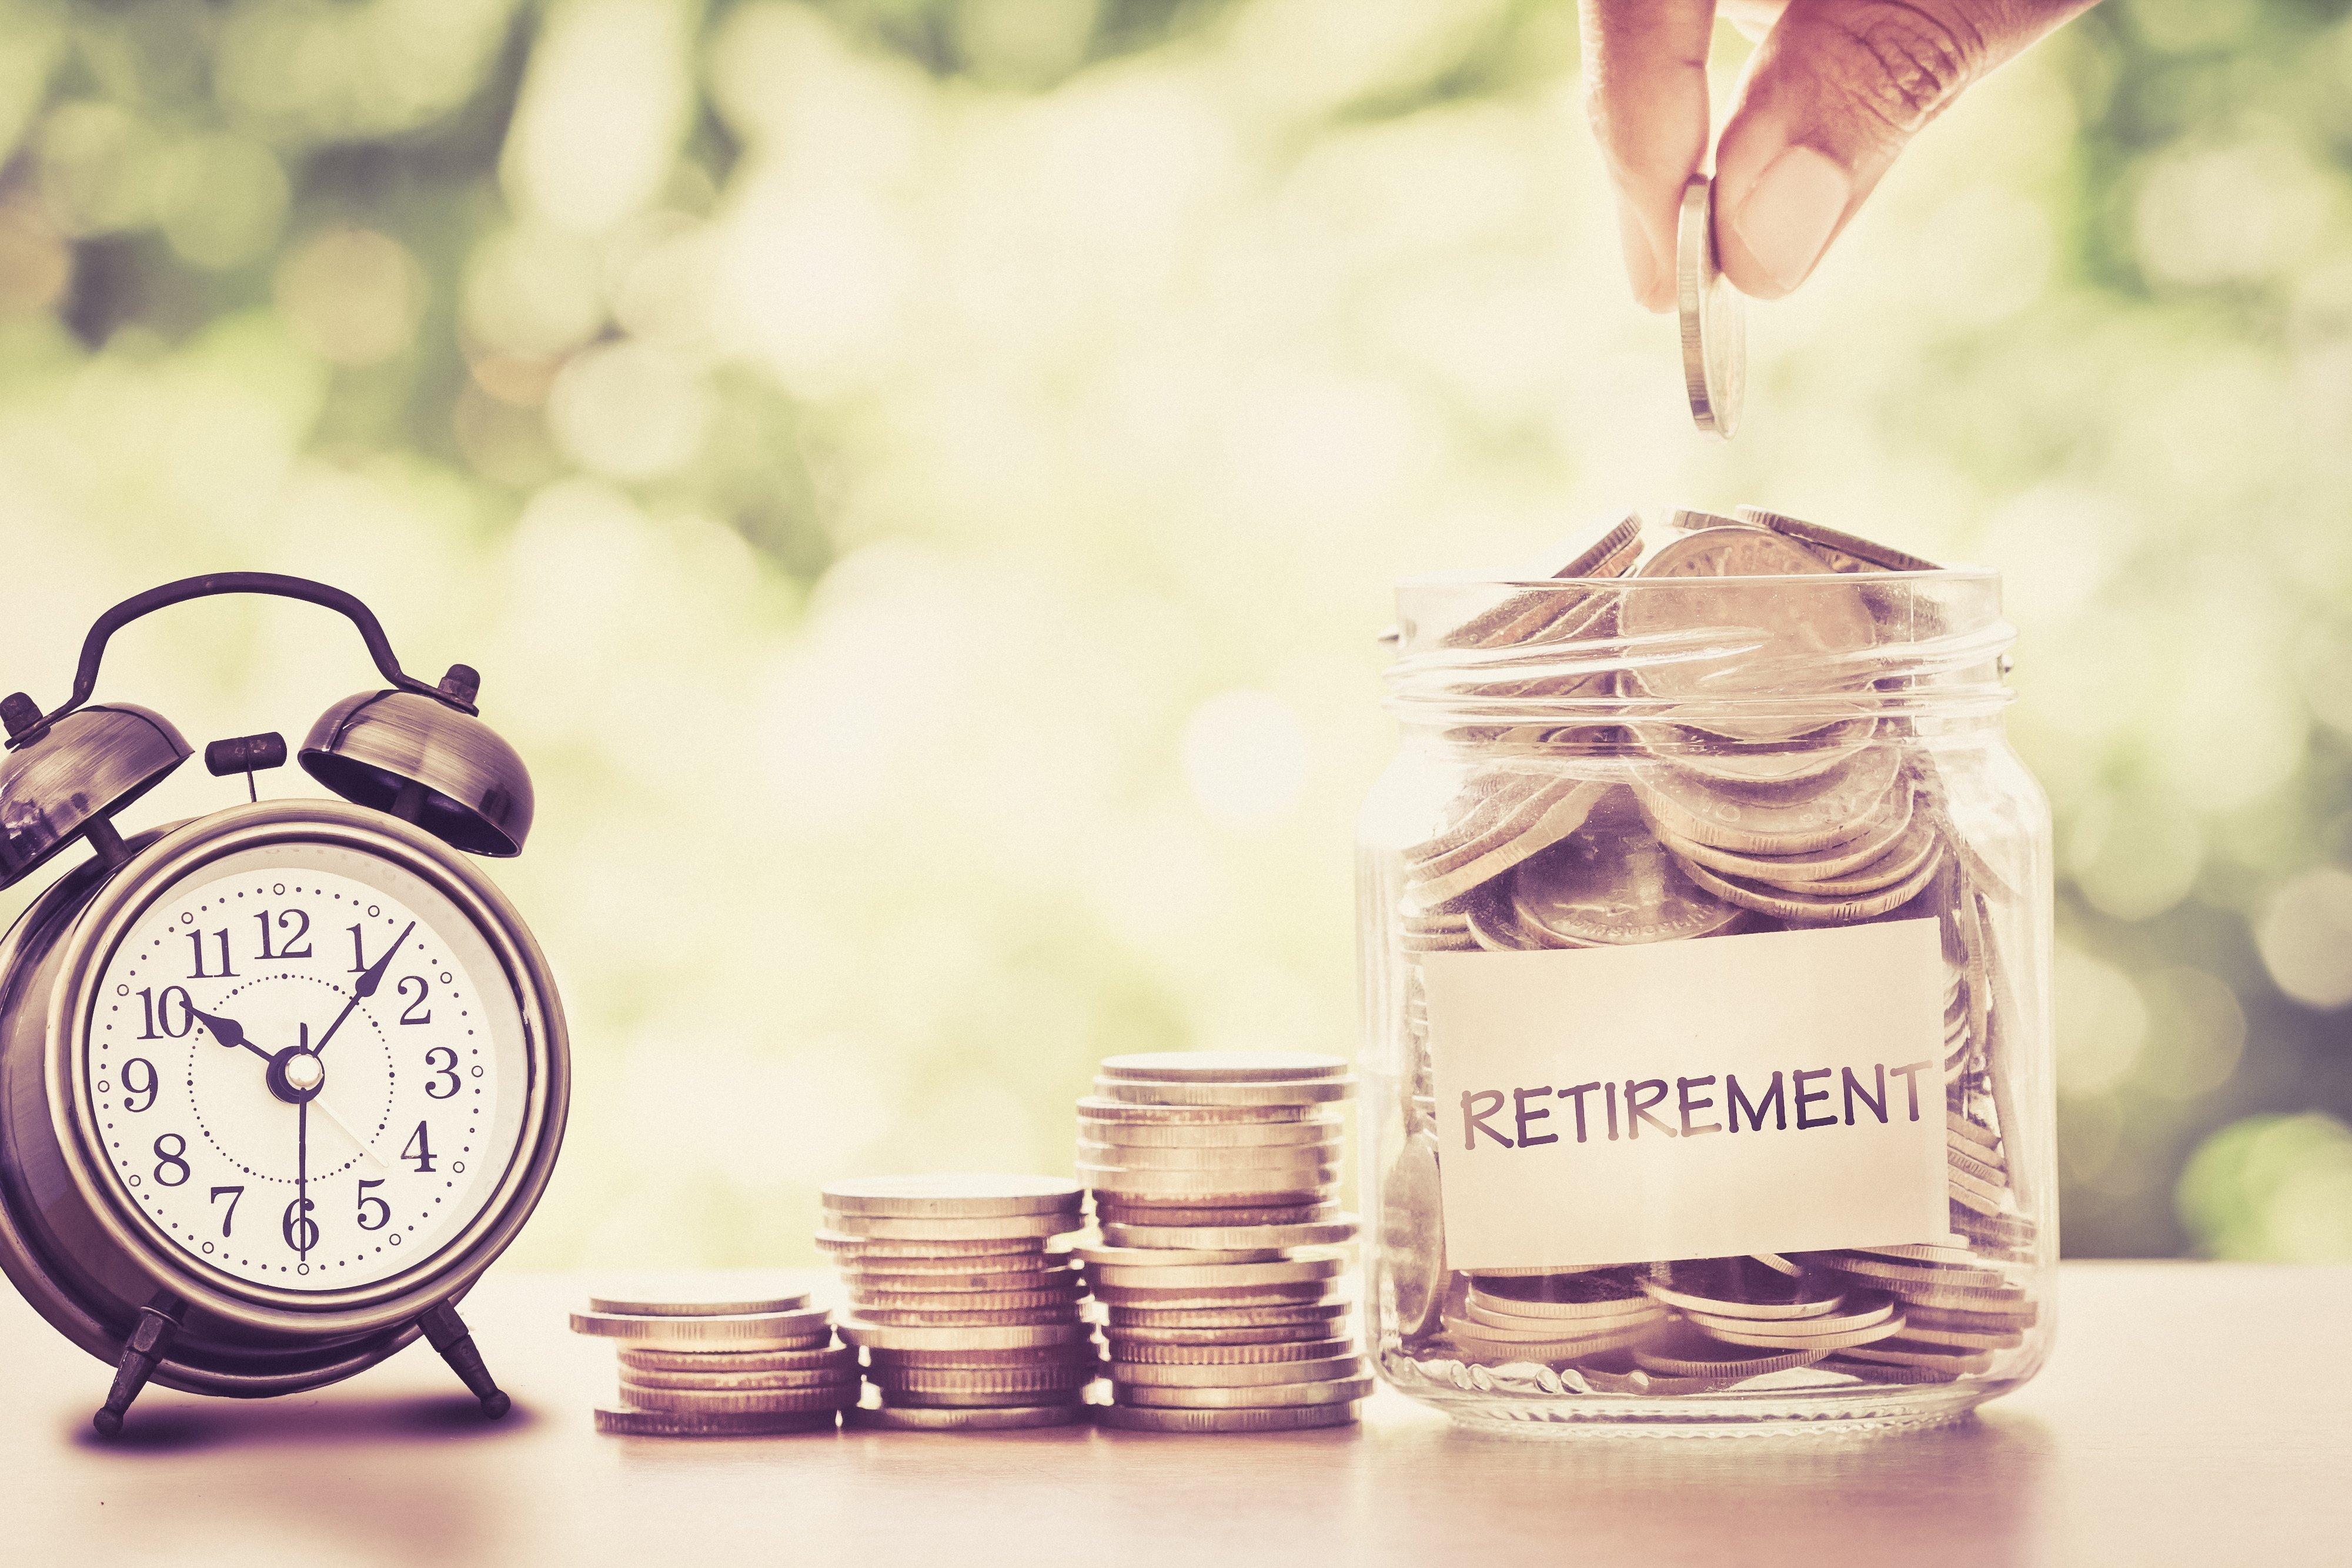 Jar of money for retirement | Photo: Shutterstock